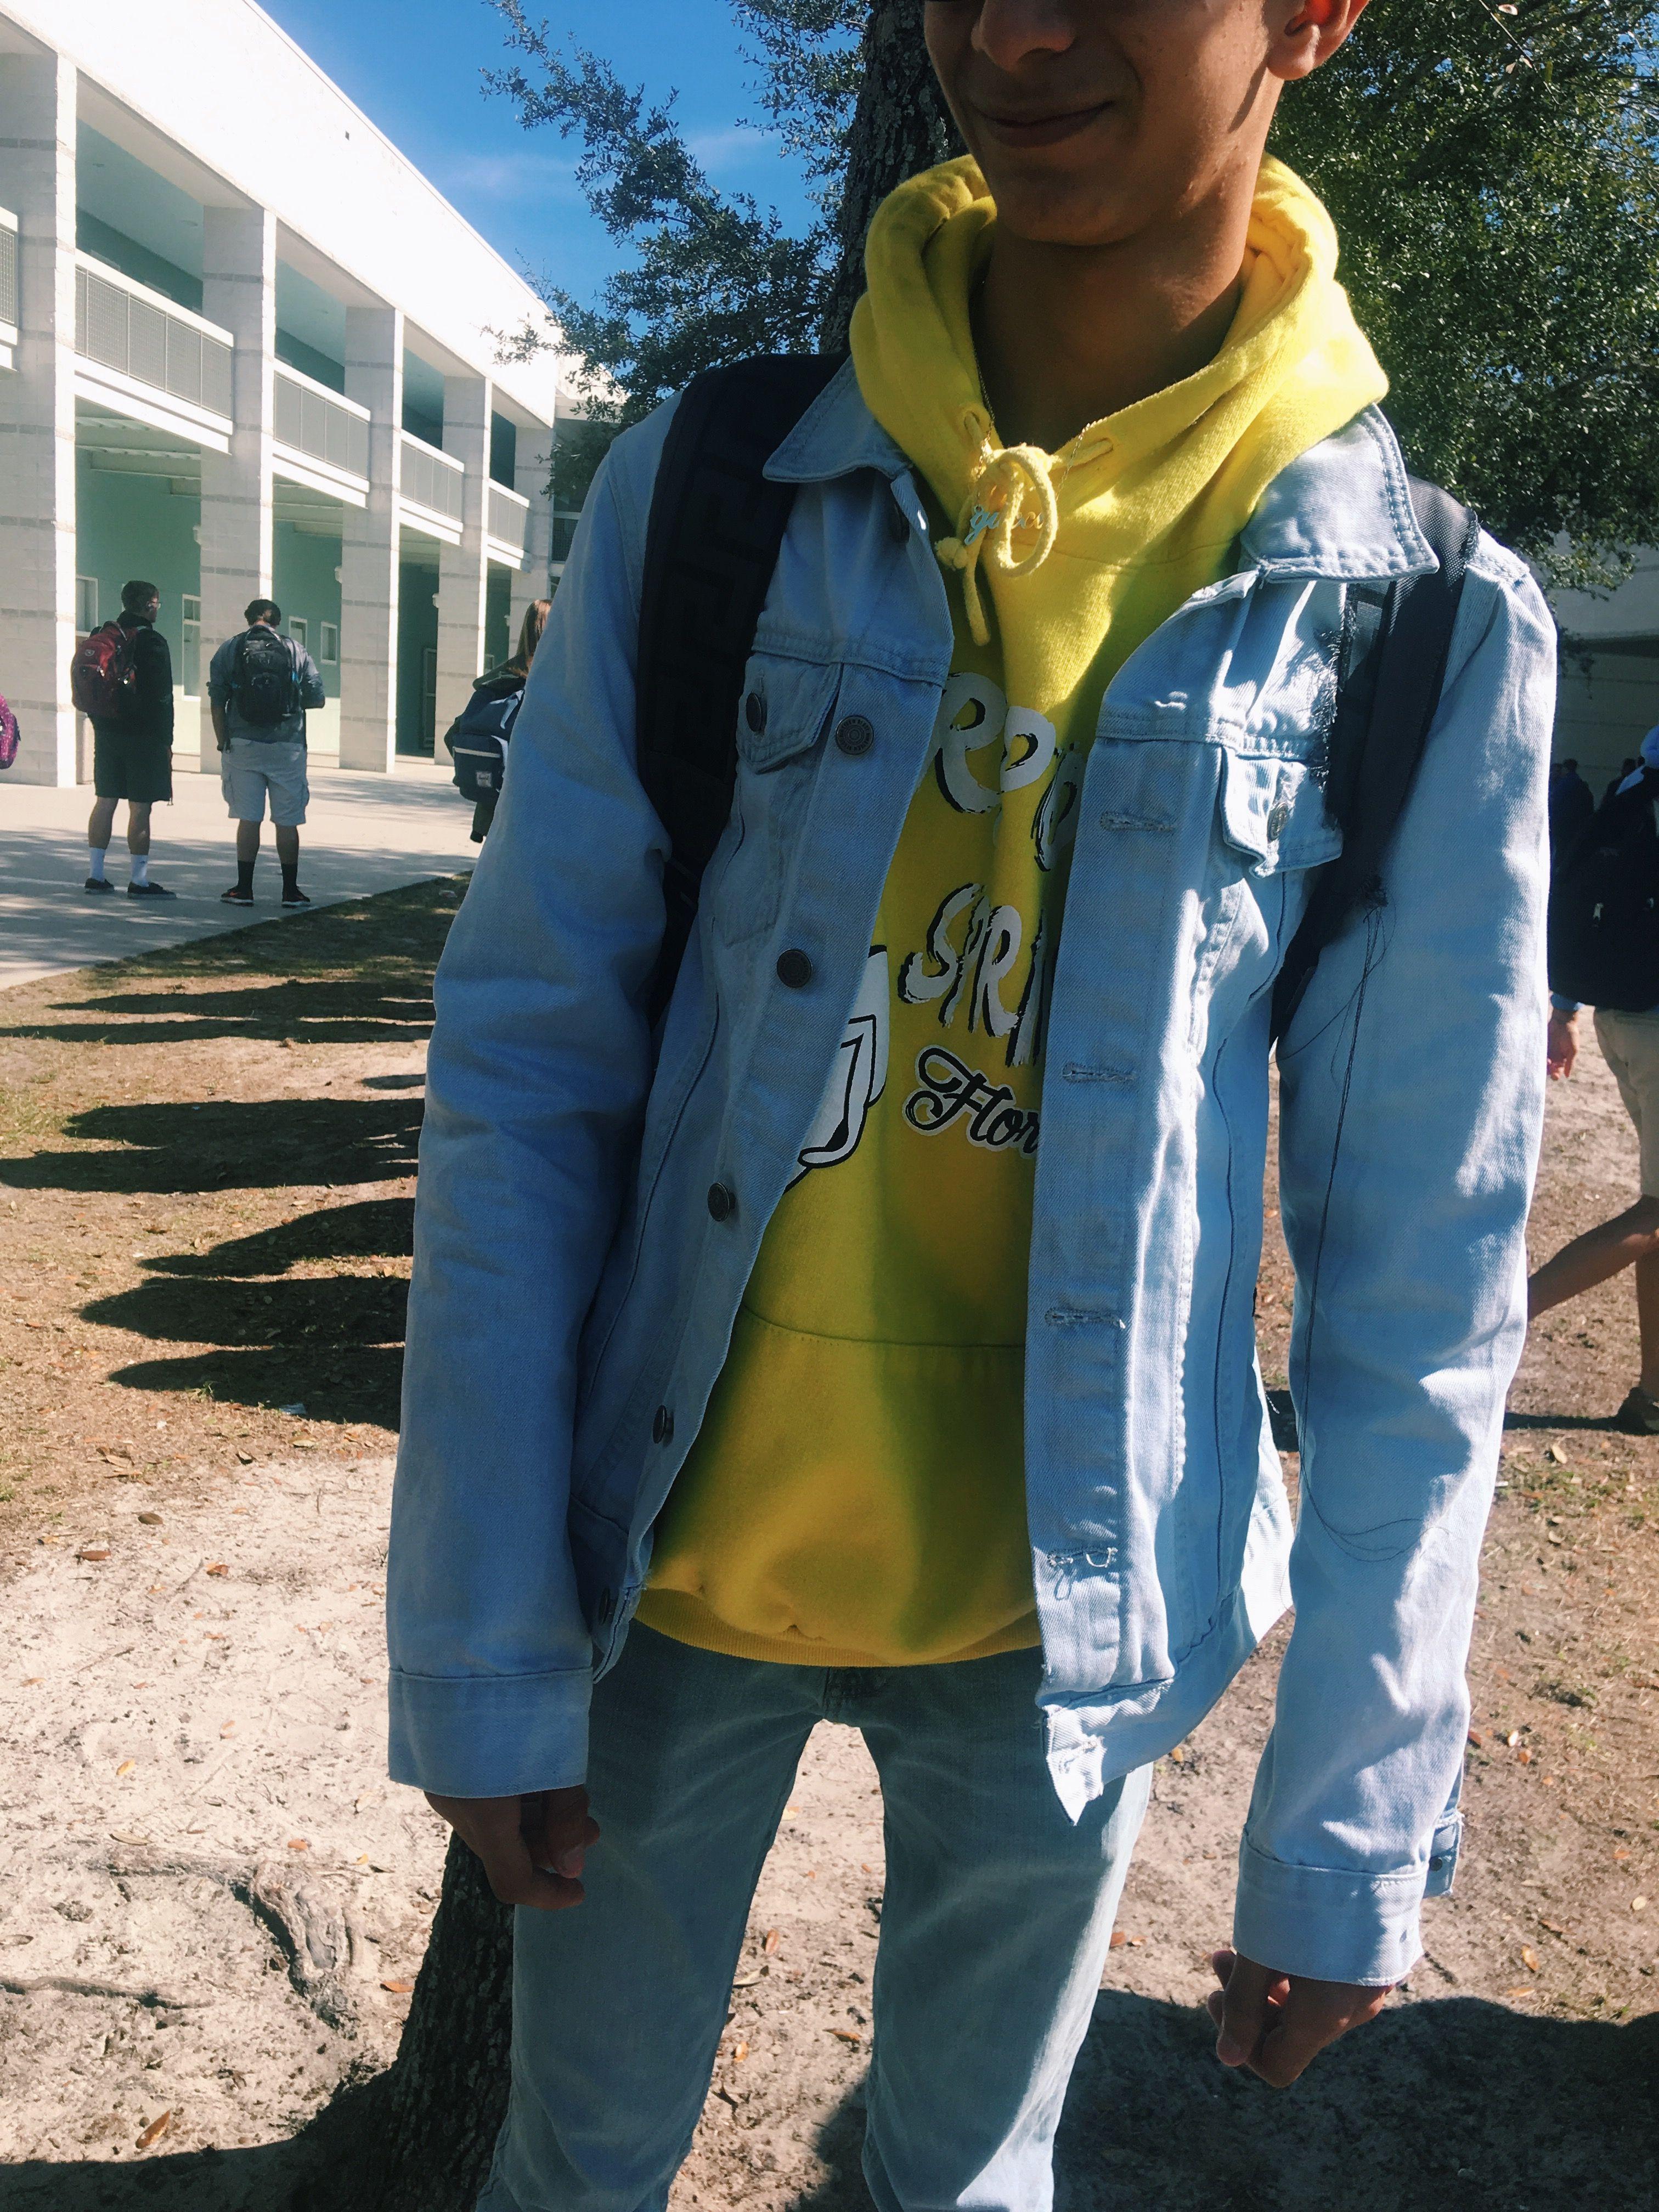 Jean Jacket One Cotton On Hoodie Walmart Jeans Pacsun Shoes Revenge X Storm High School Fashion Fashion Pacsun Shoes [ 4032 x 3024 Pixel ]